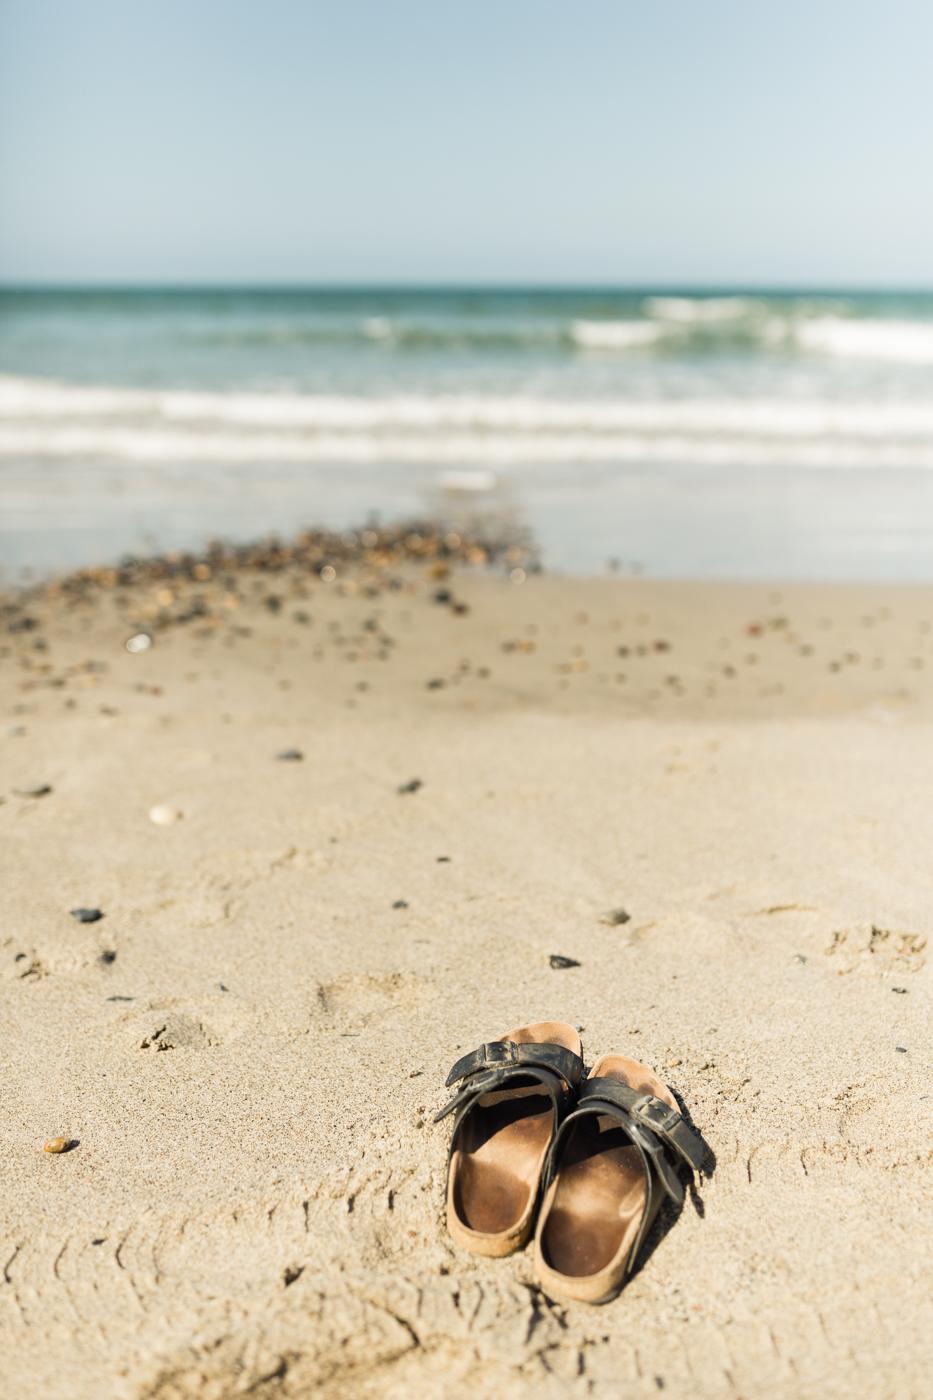 Christa Norman San Clemente Wedding Photographer - Goals for June